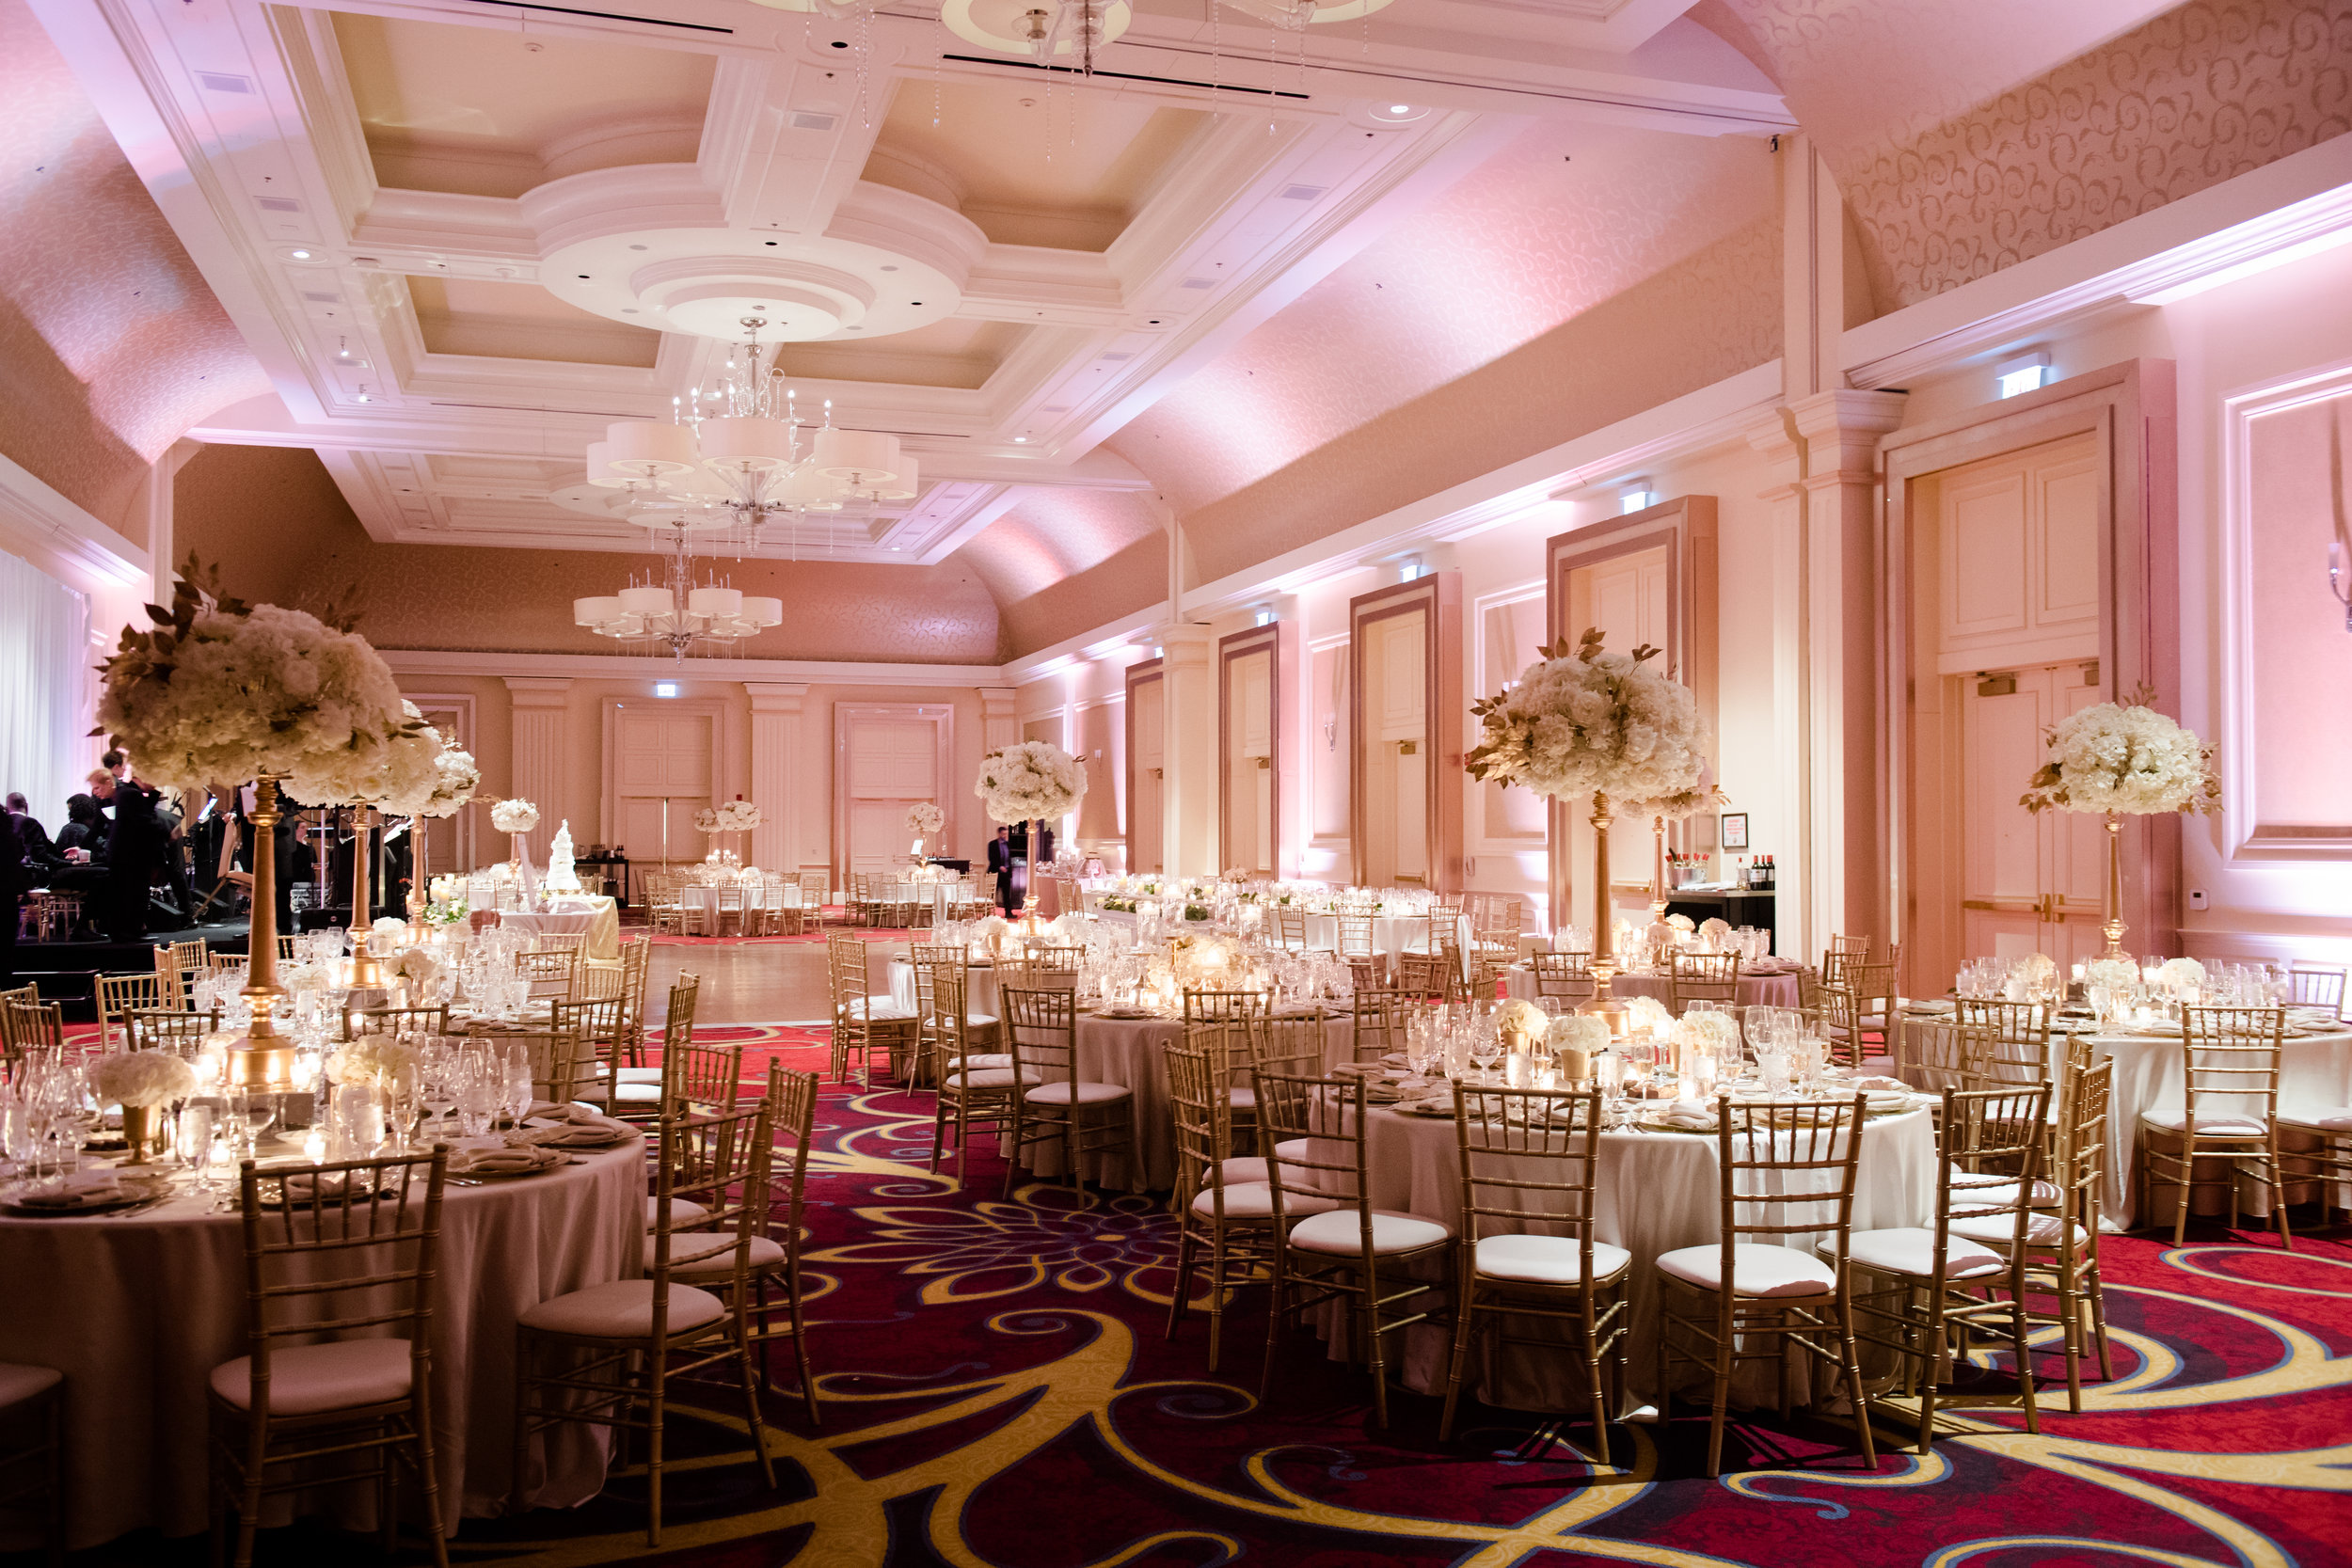 Elegant wedding at the JW Marriott Chicago25.jpg